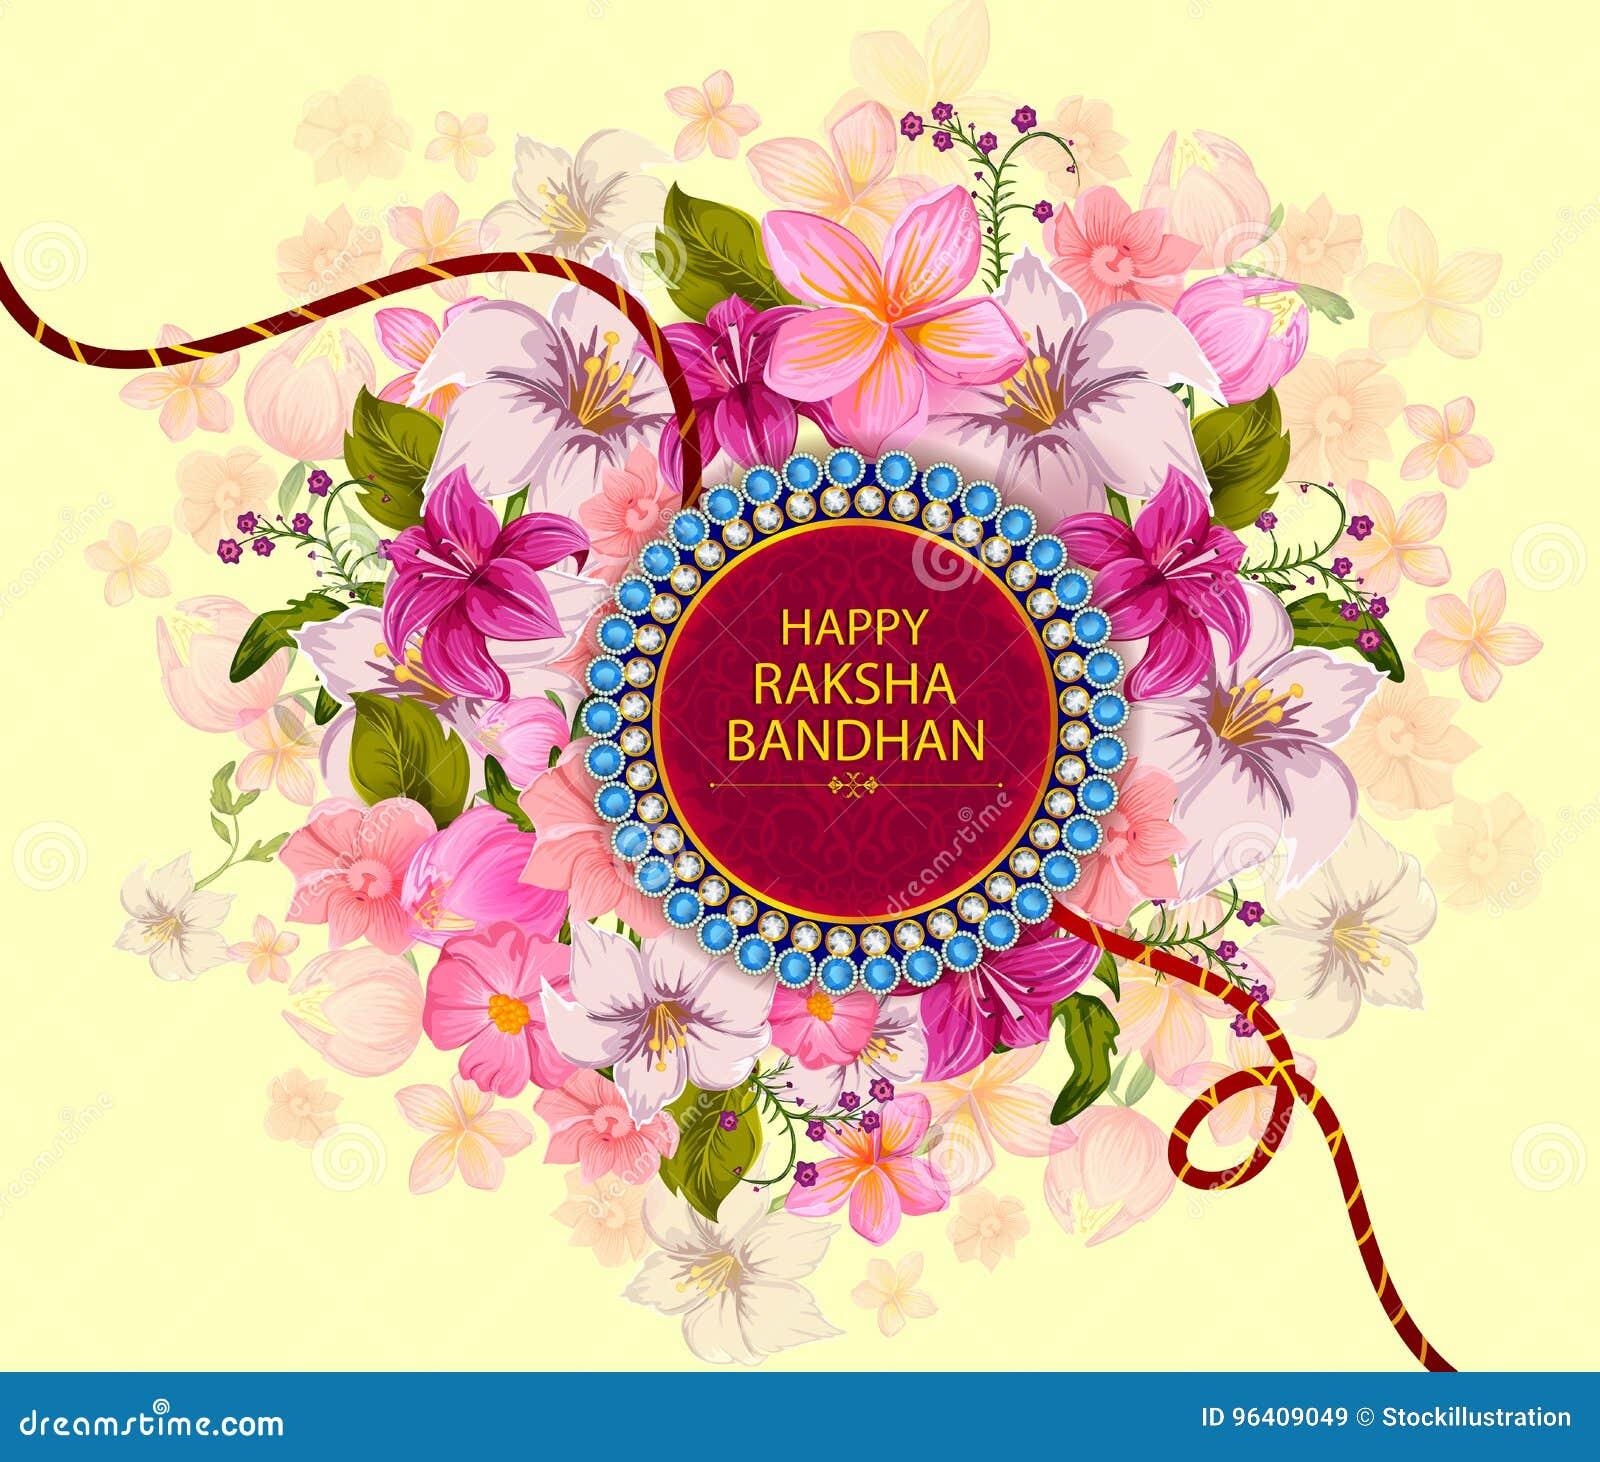 Elegant Rakhi For Brother And Sister Bonding In Raksha Bandhan